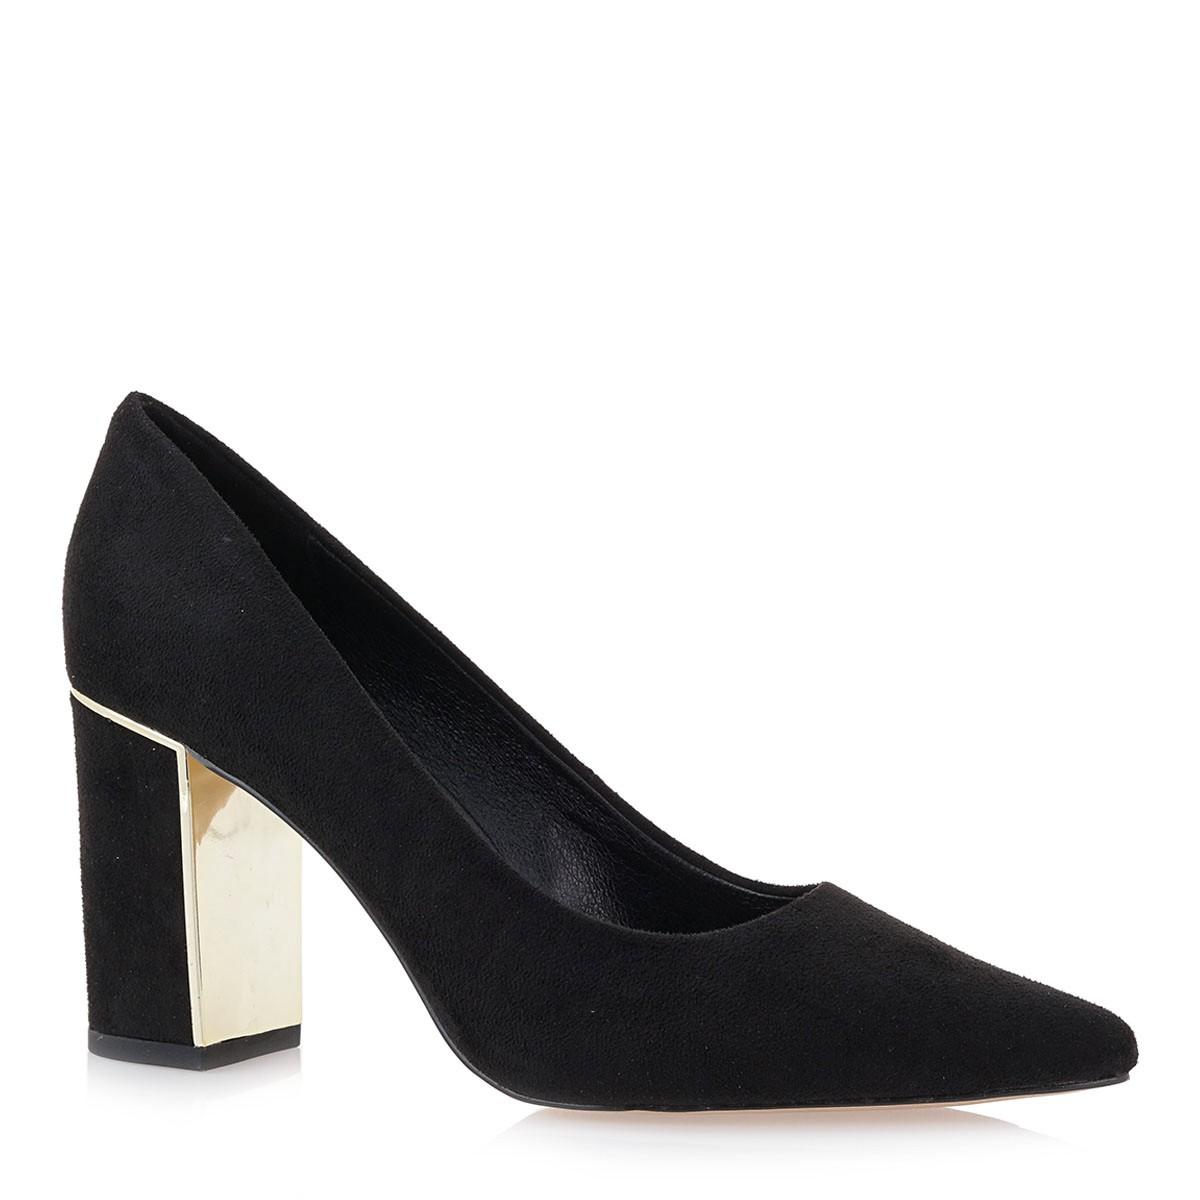 Exe Shoes Γυναικείες Γόβες 125-CLAUDIA Μαύρο Καστόρι J17001254004